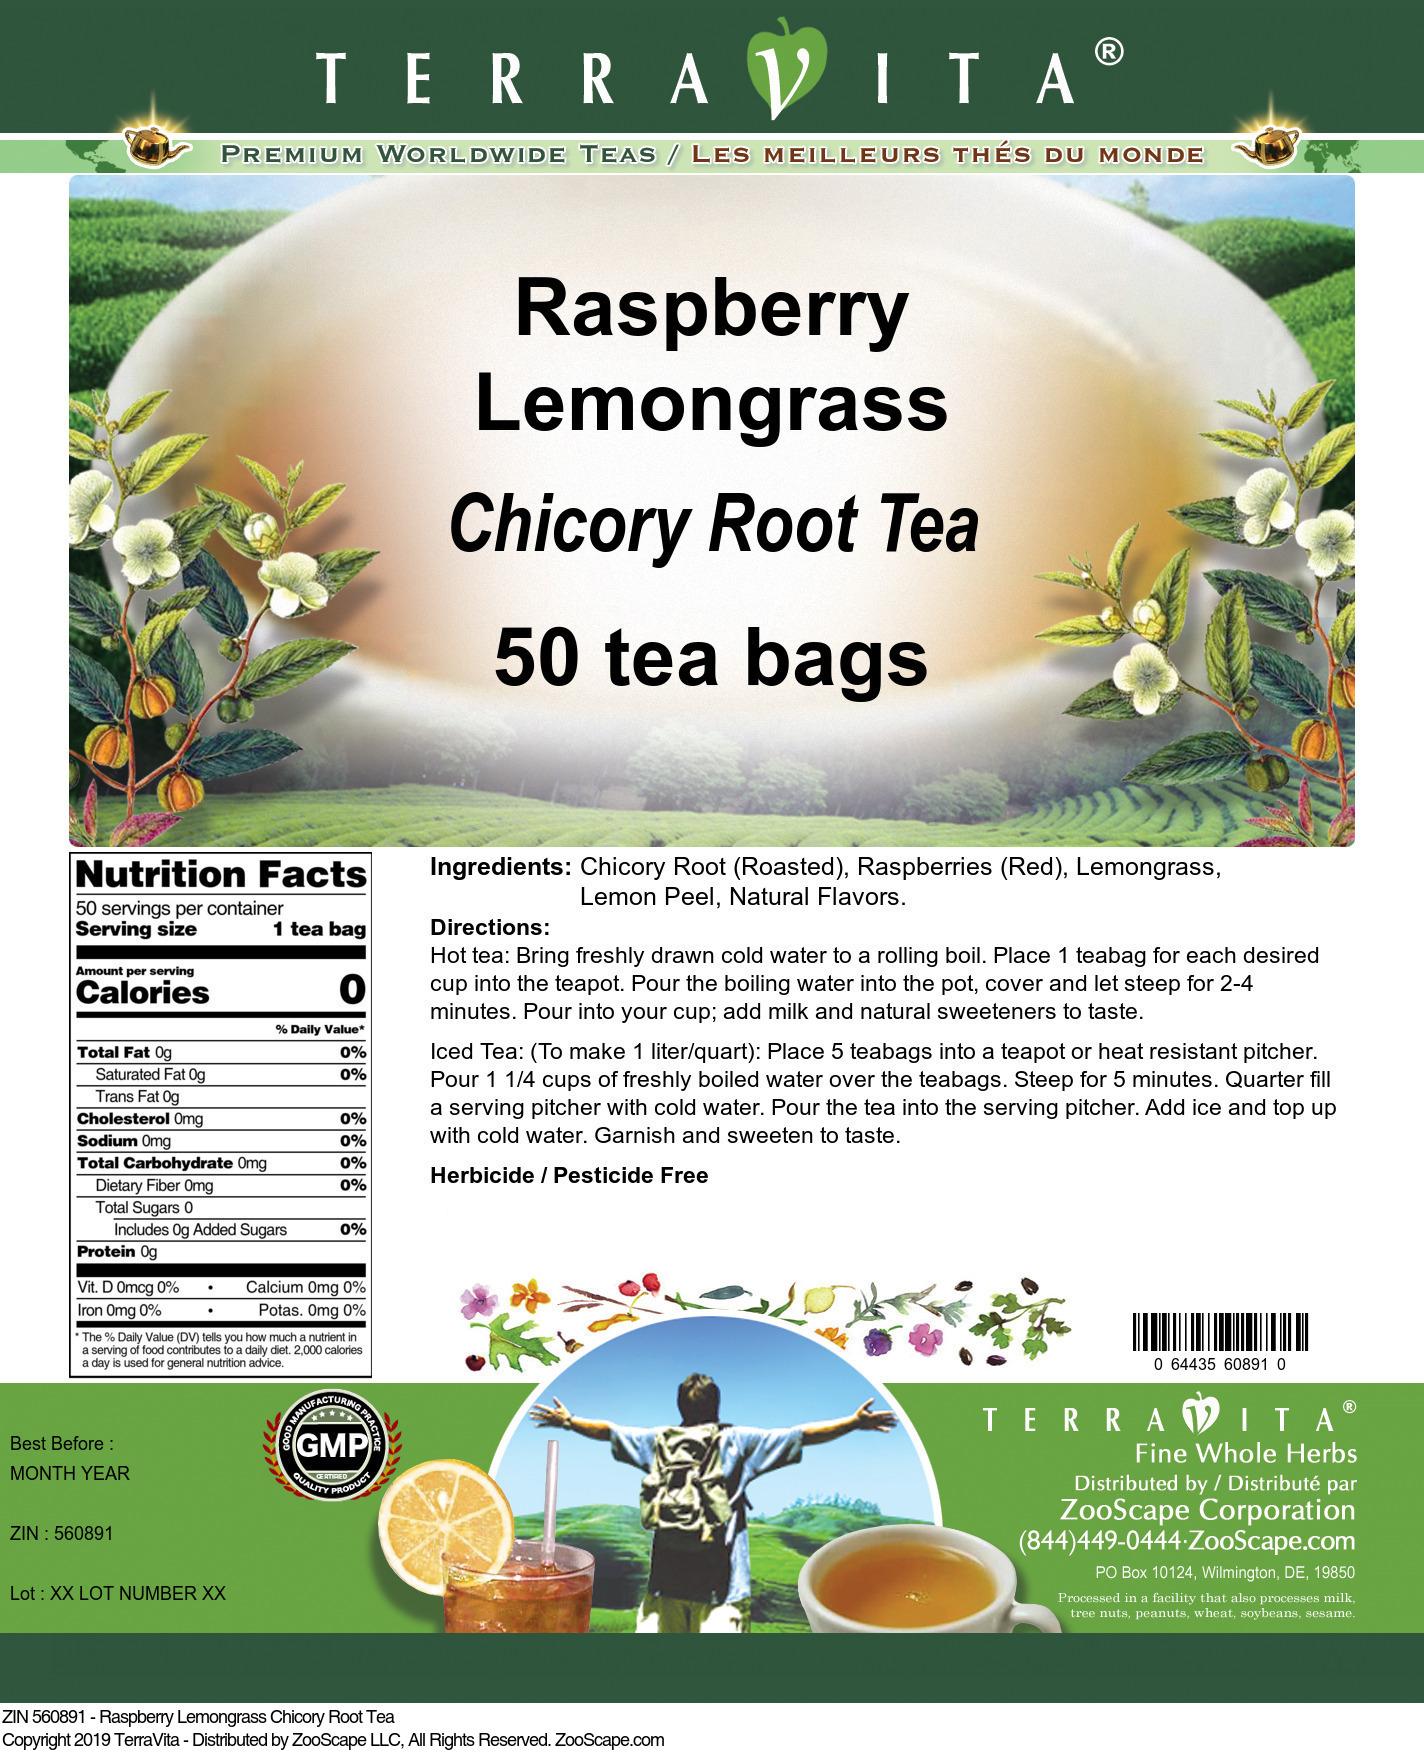 Raspberry Lemongrass Chicory Root Tea